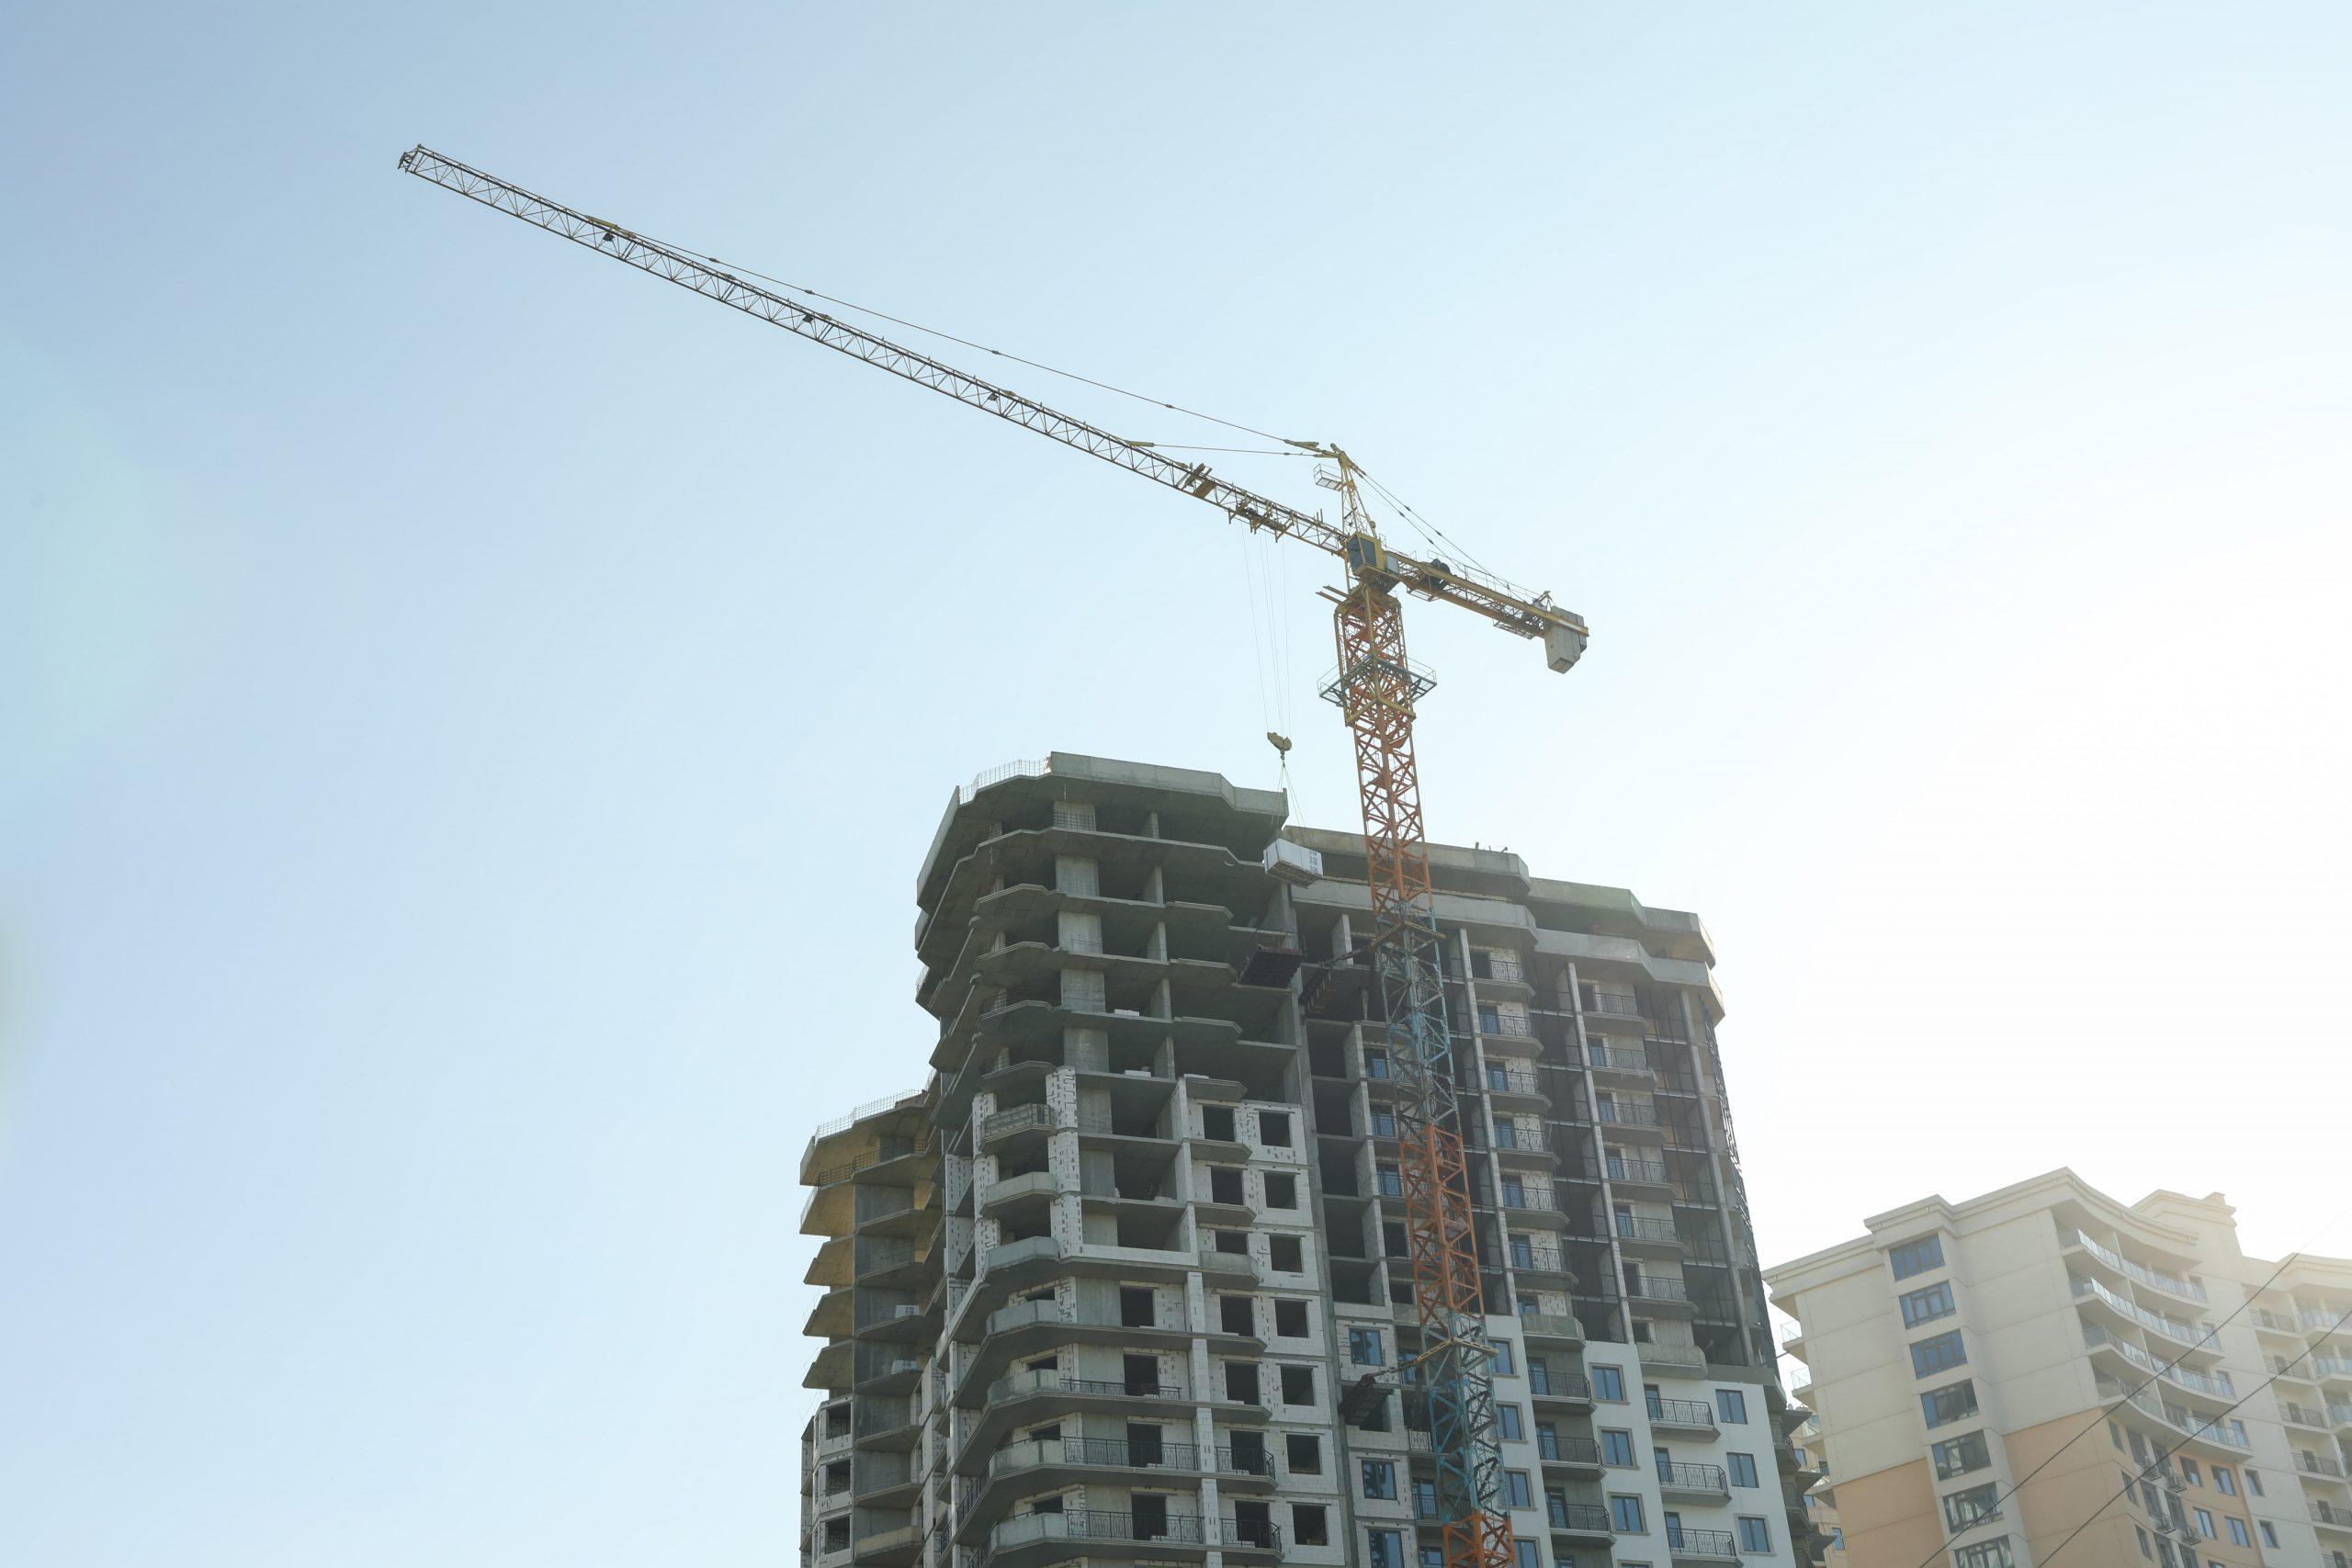 high-rise-construction-with-crane-against-blue-sky-C8LHC77